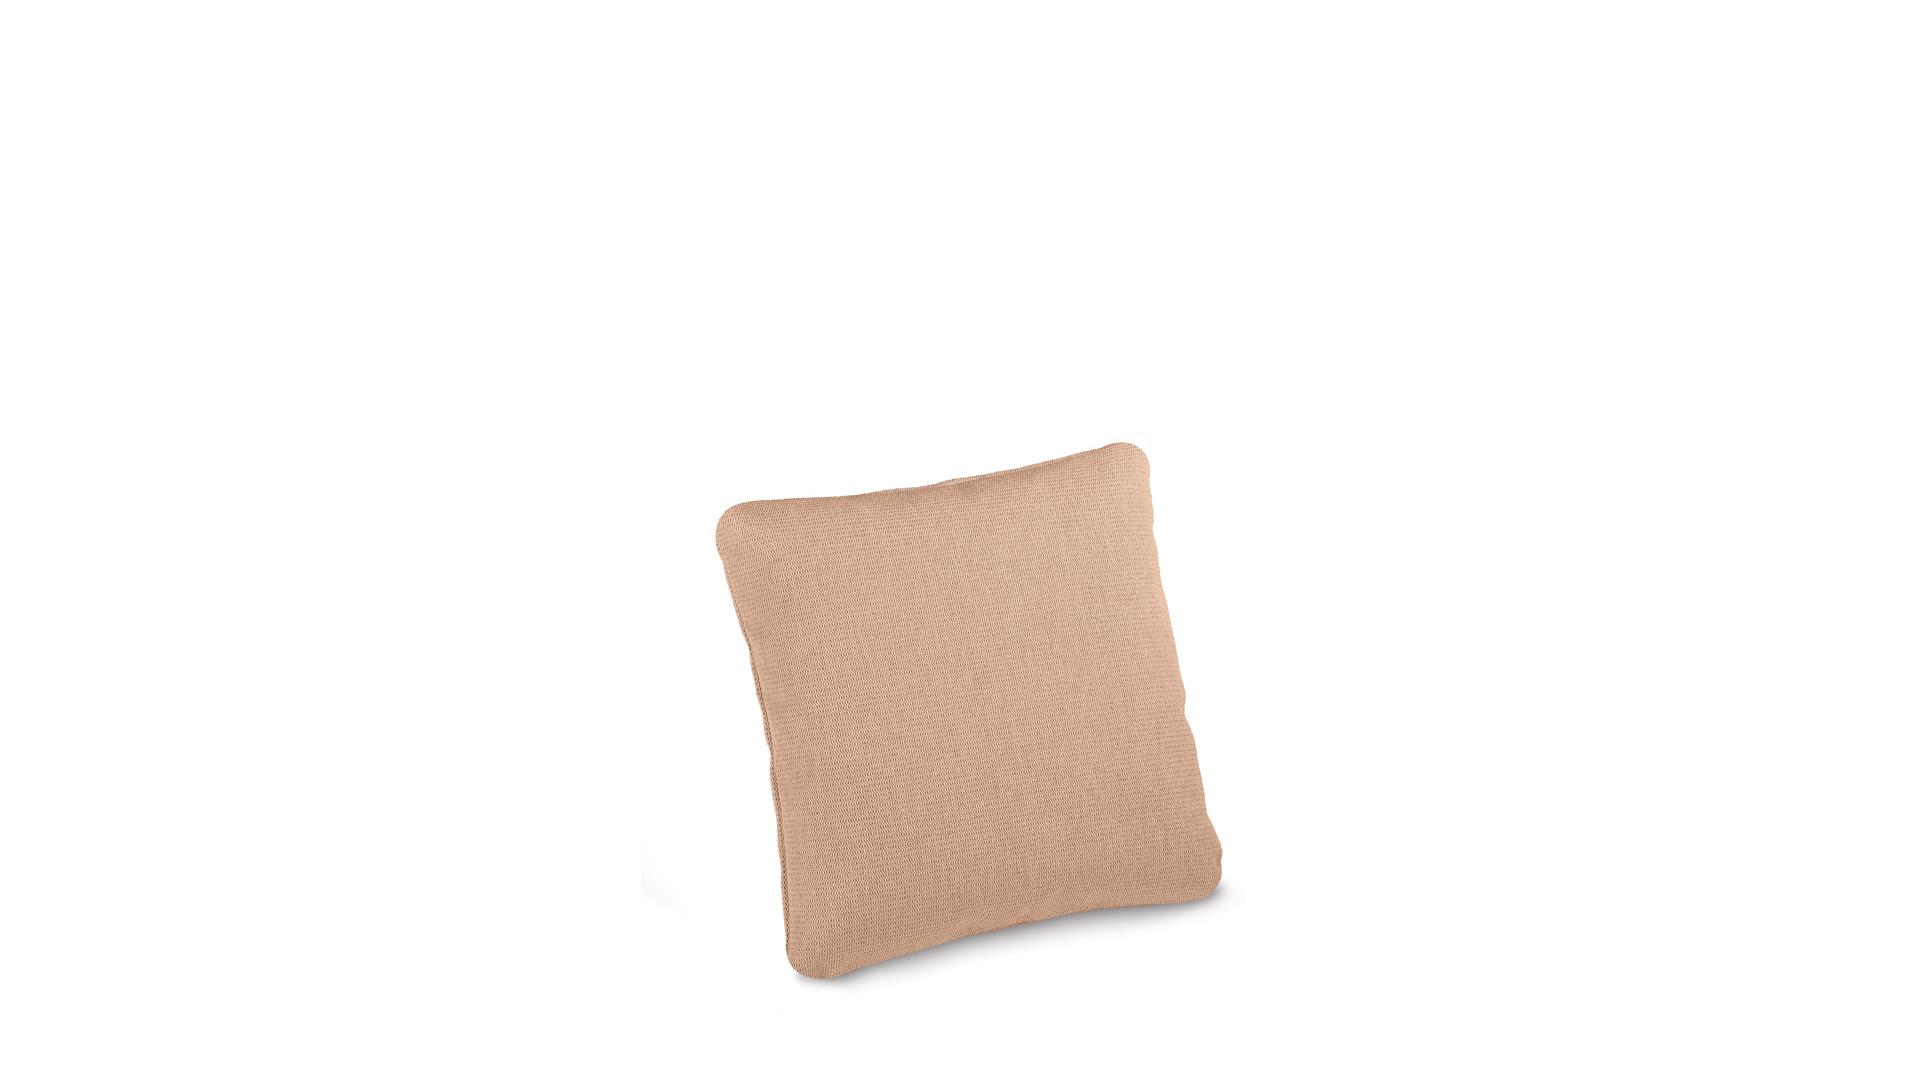 DEDON-BRIXX-Square-cushion-shore-1920x1266px.jpg